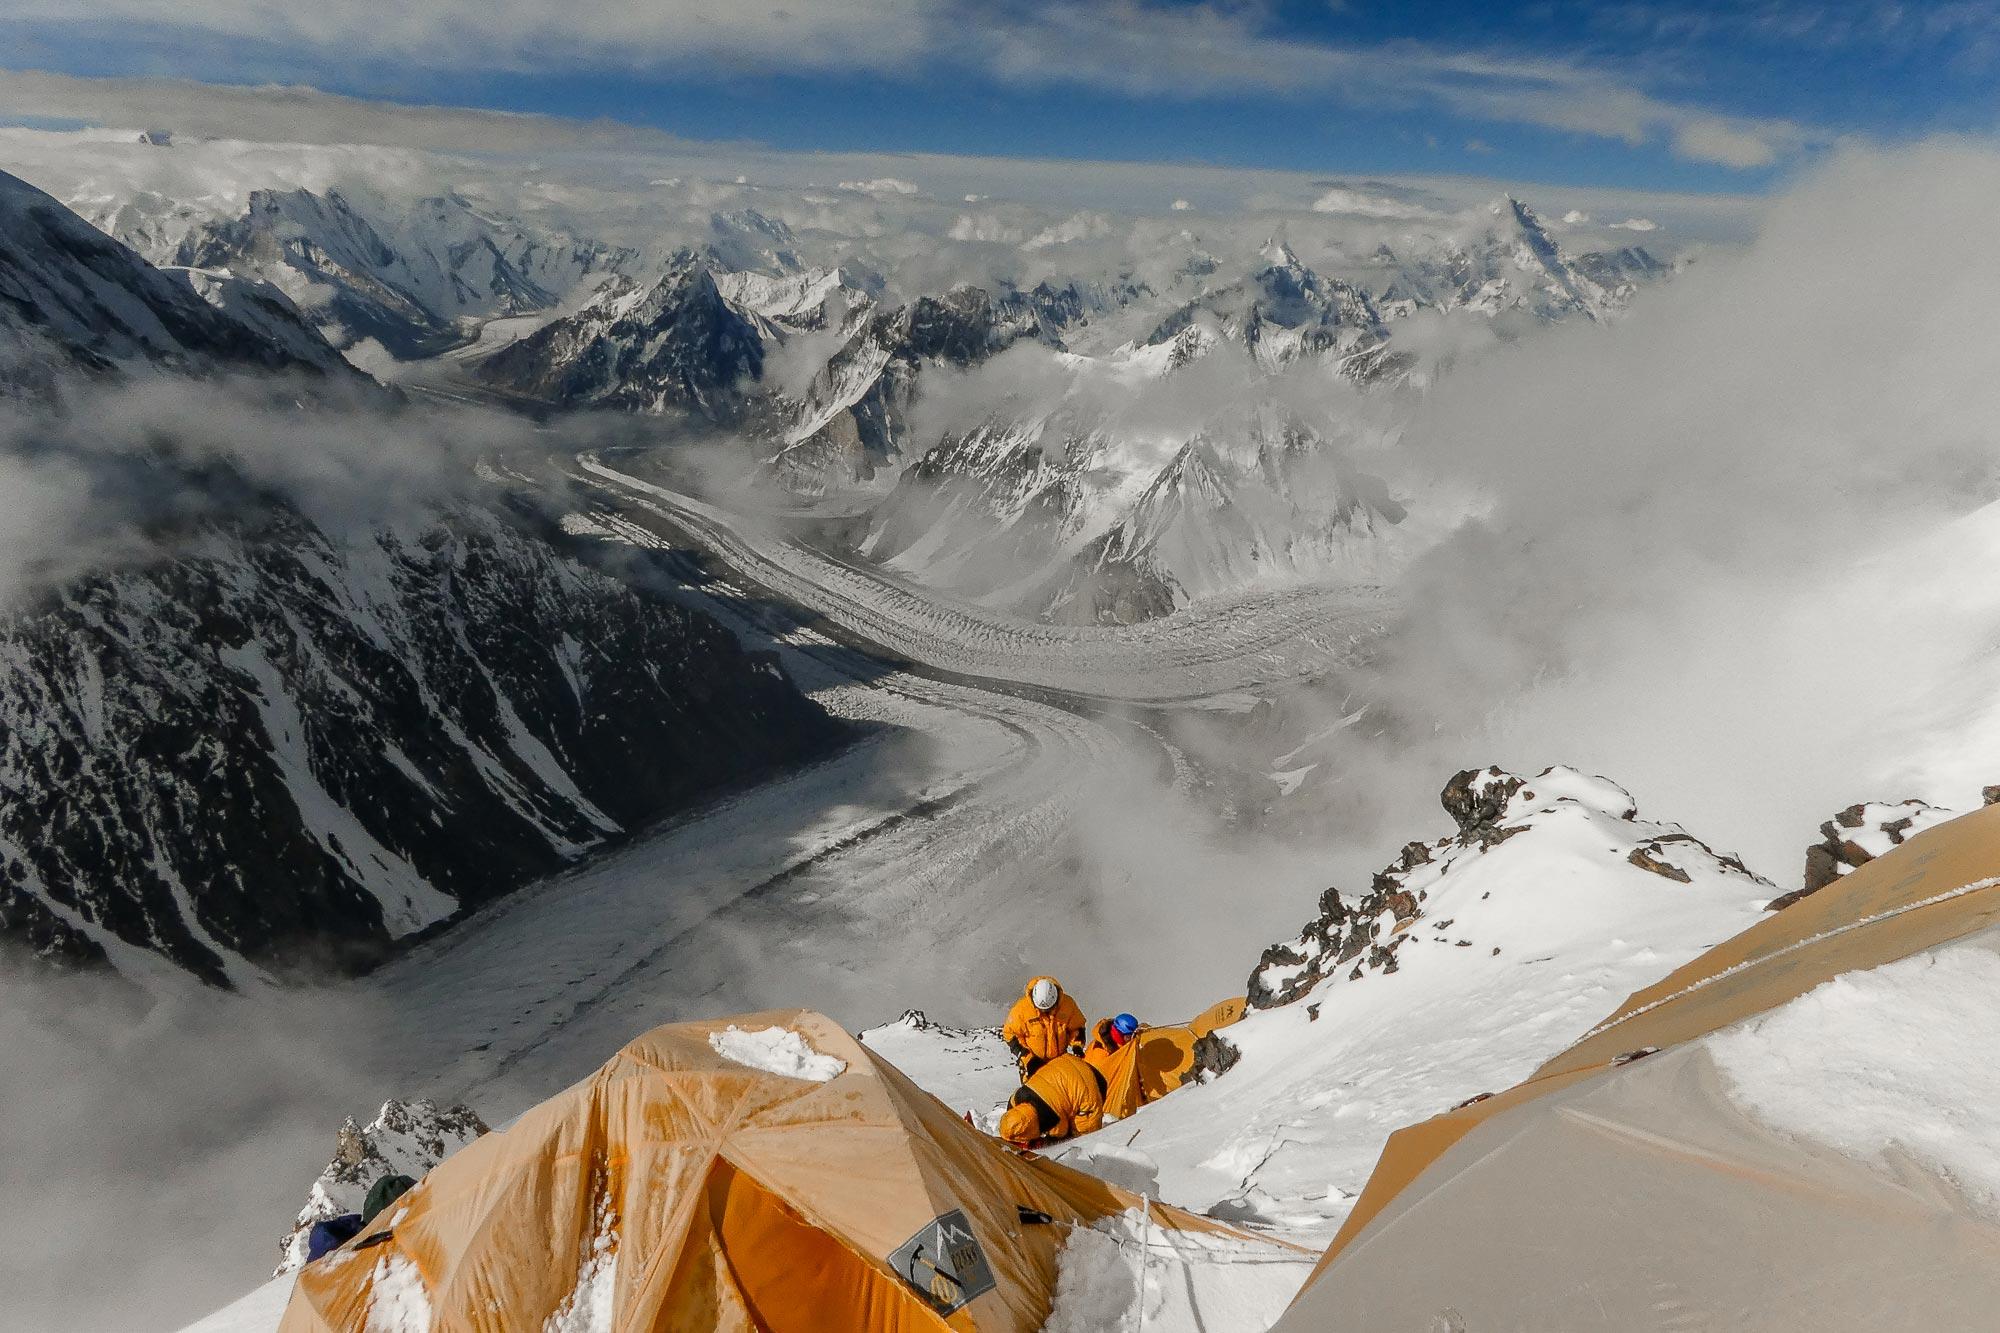 Climbing new horizons, inspiring personal and professional development